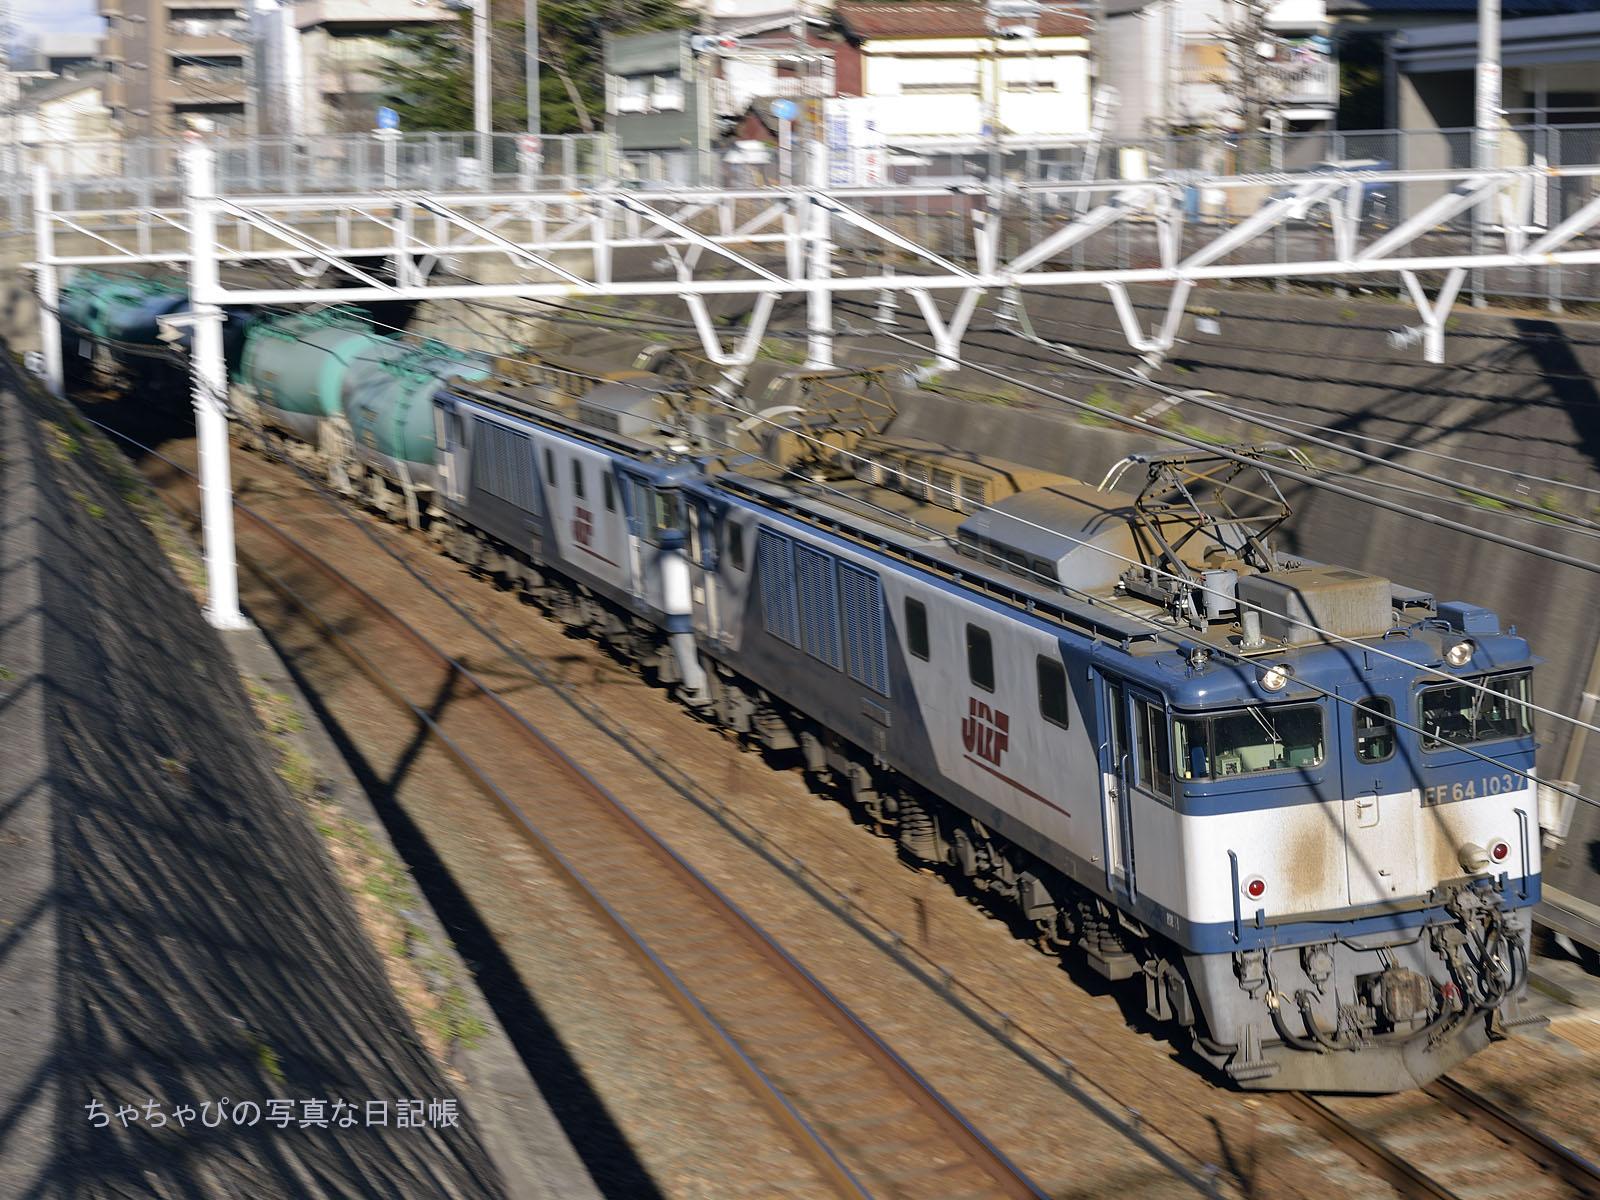 EF64 1037+EF64 1003